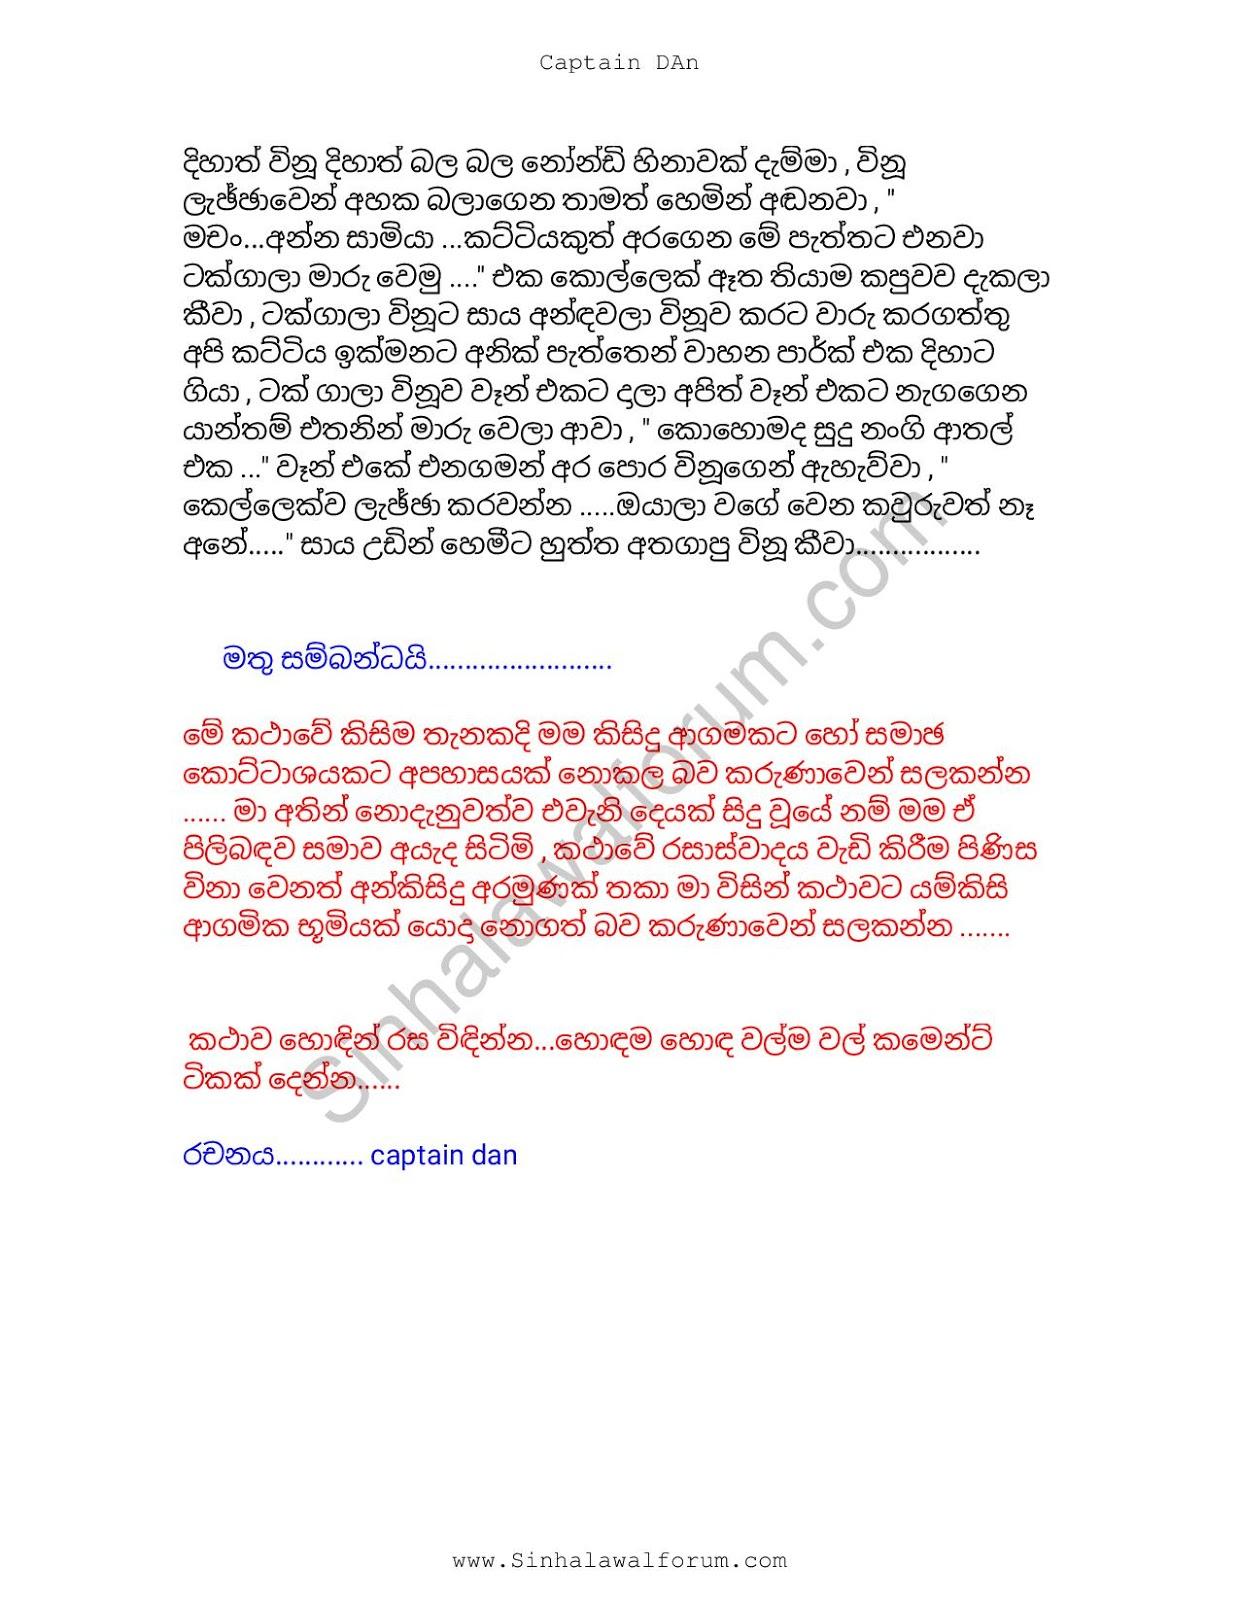 Response to quot mage wife amuthu ashawa 12 quot